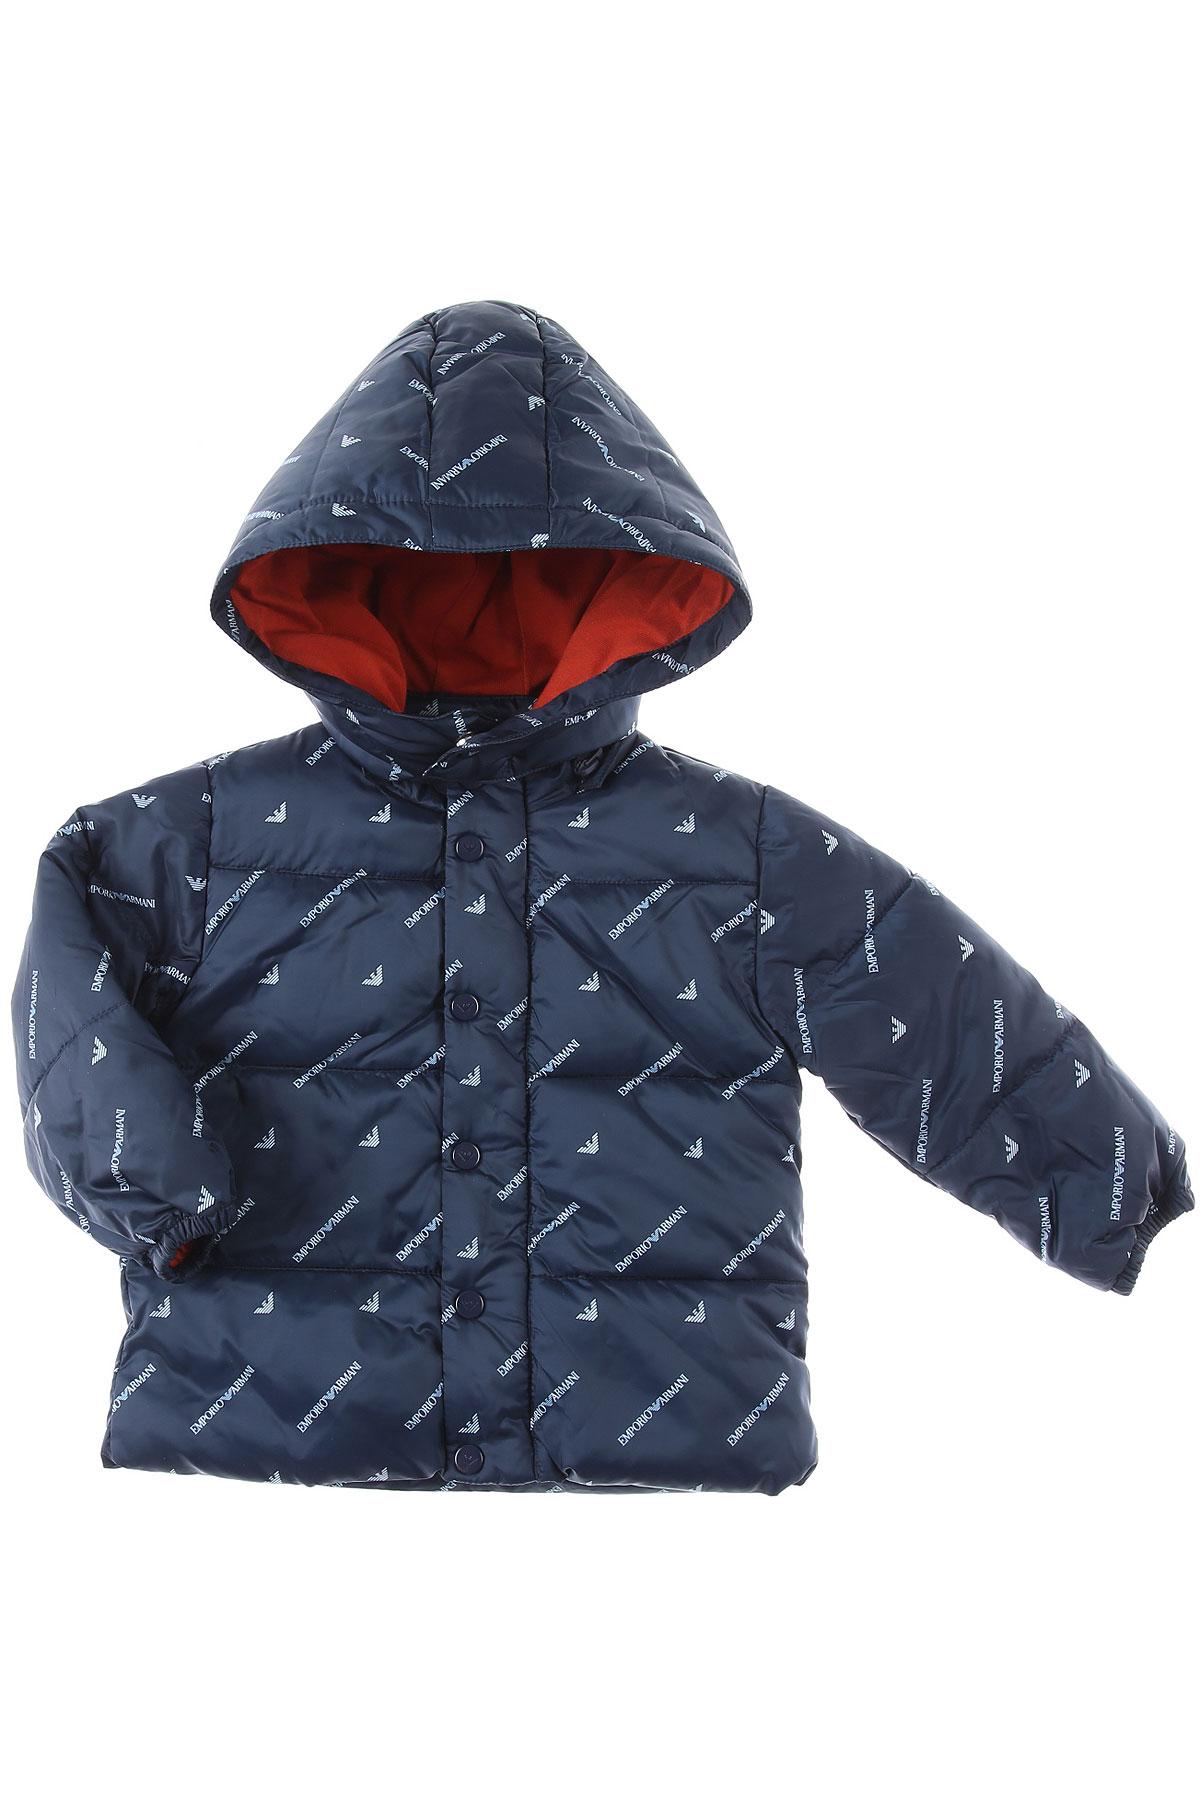 Emporio Armani Baby Down Jacket for Boys On Sale, Blue, polyester, 2019, 18M 2Y 3Y